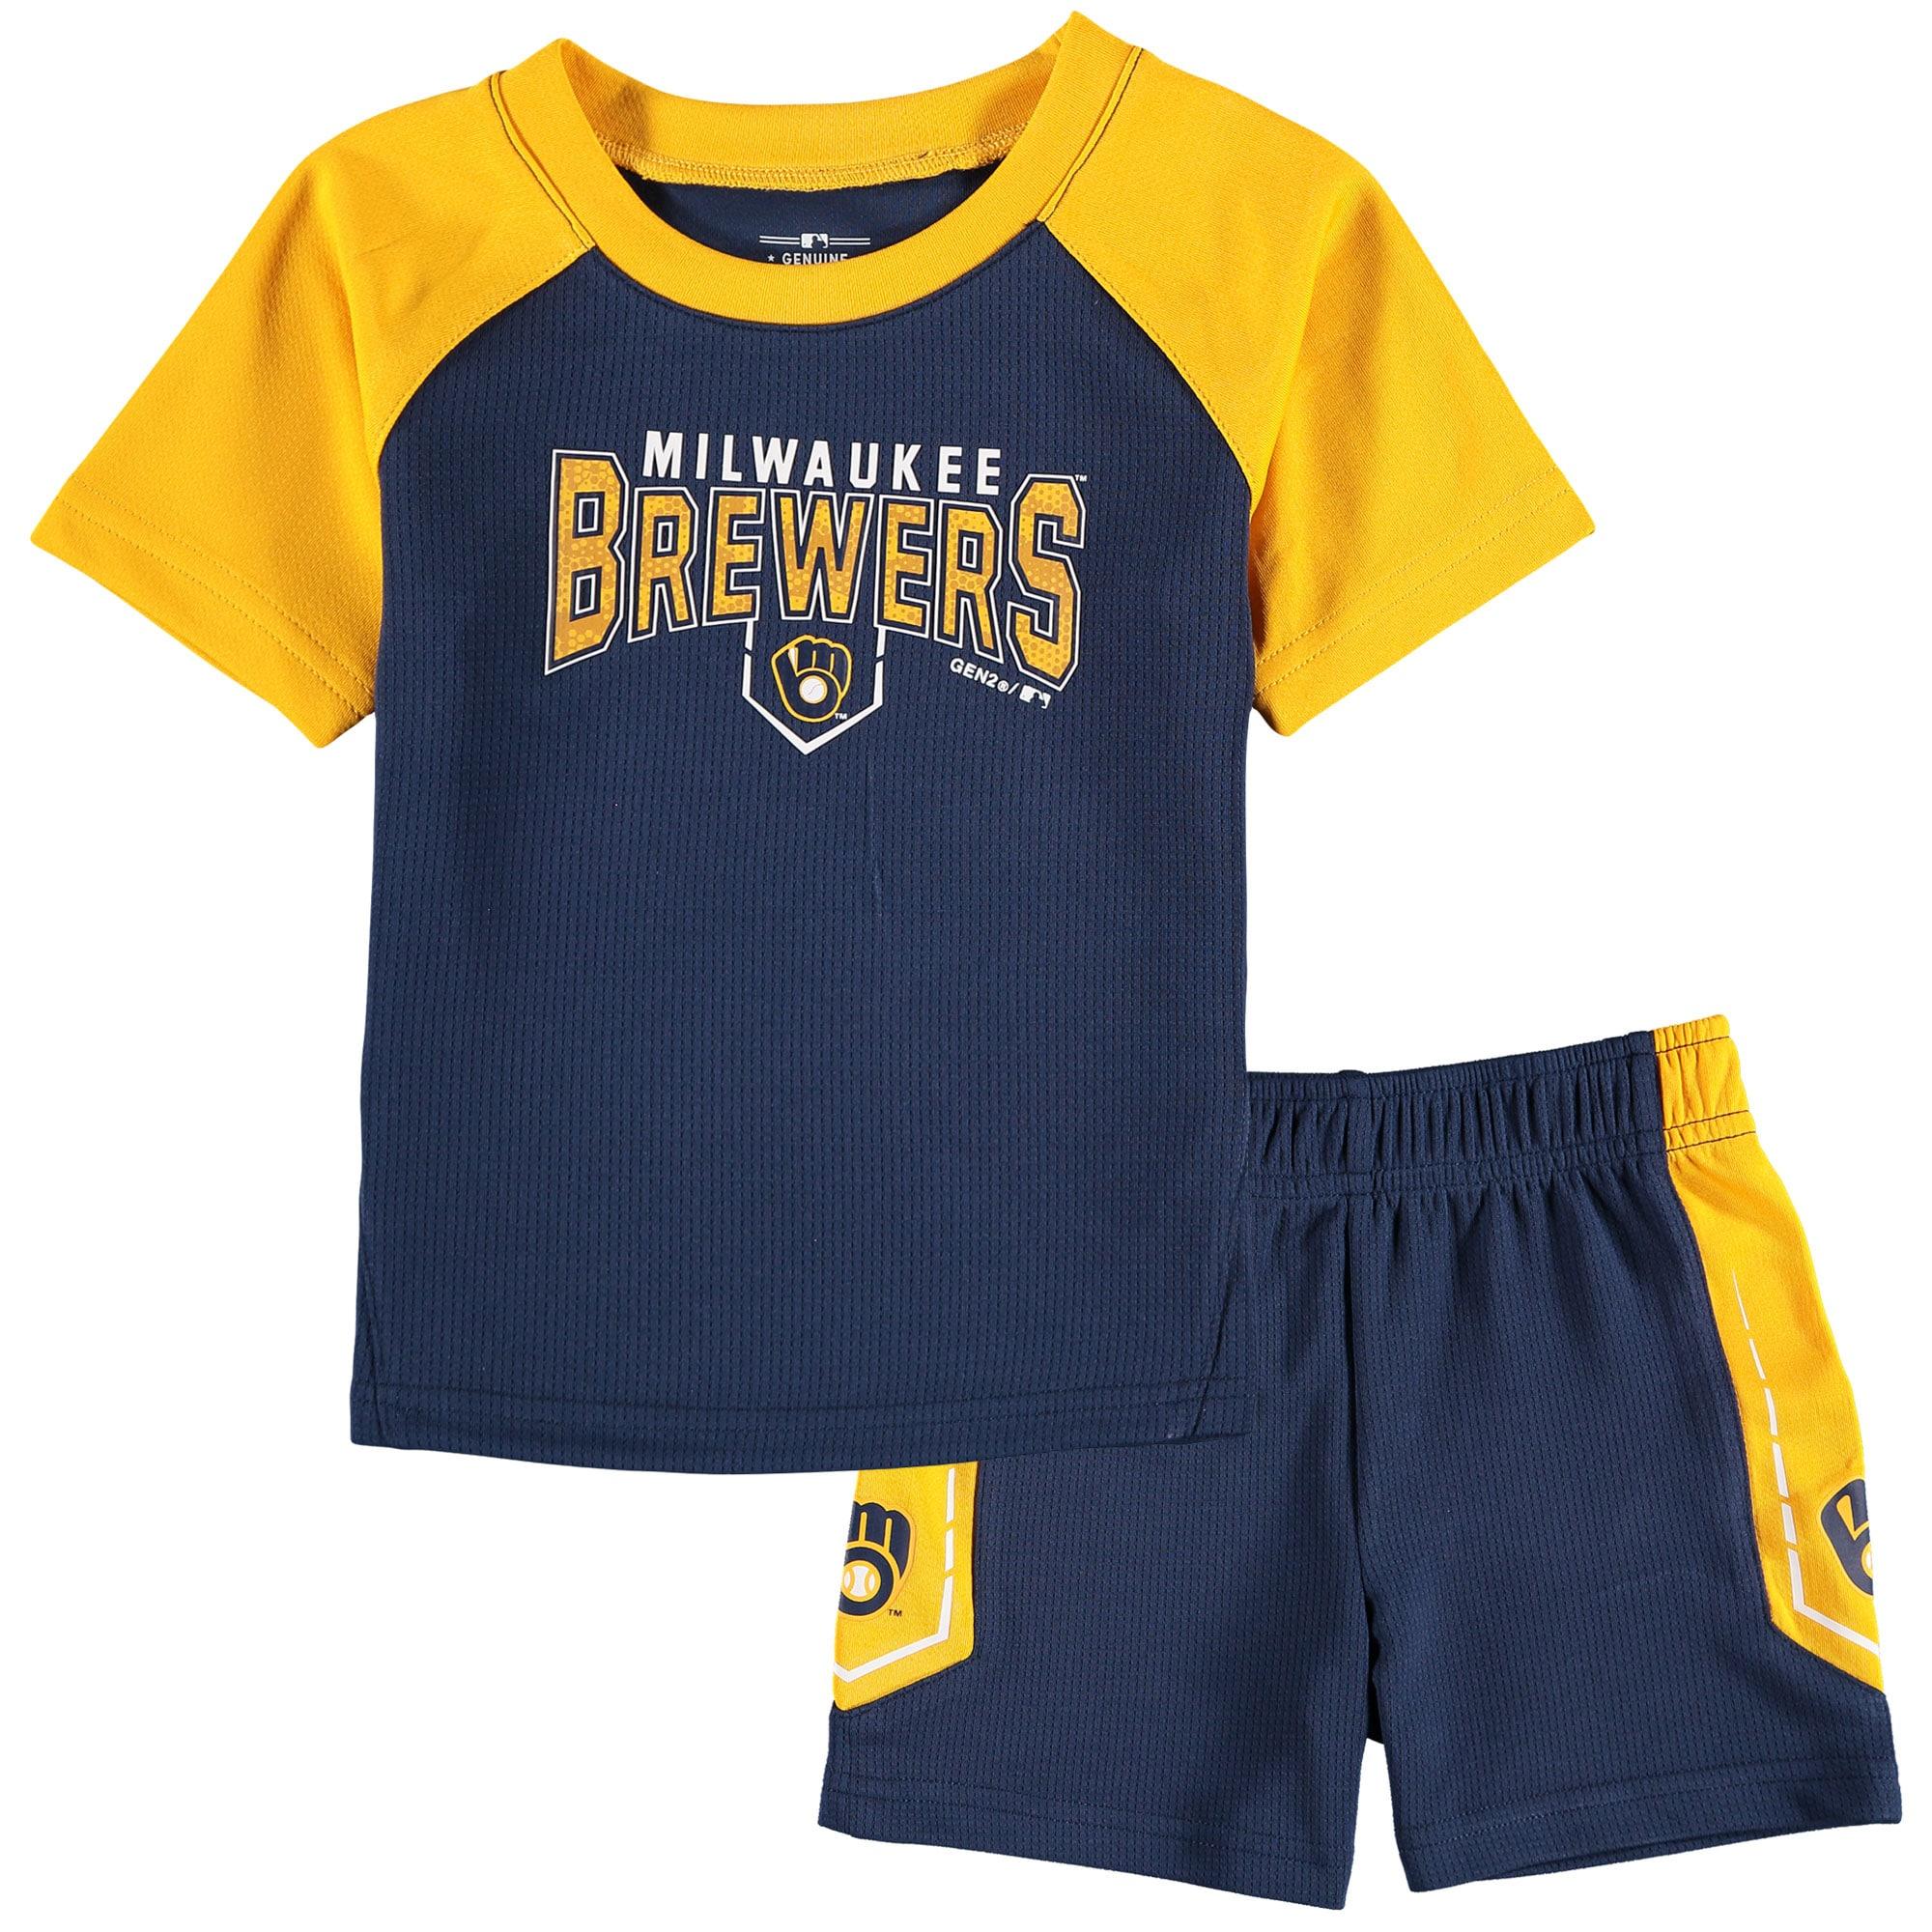 Milwaukee Brewers Infant Follow Through T-Shirt & Shorts Set - Navy/Gold